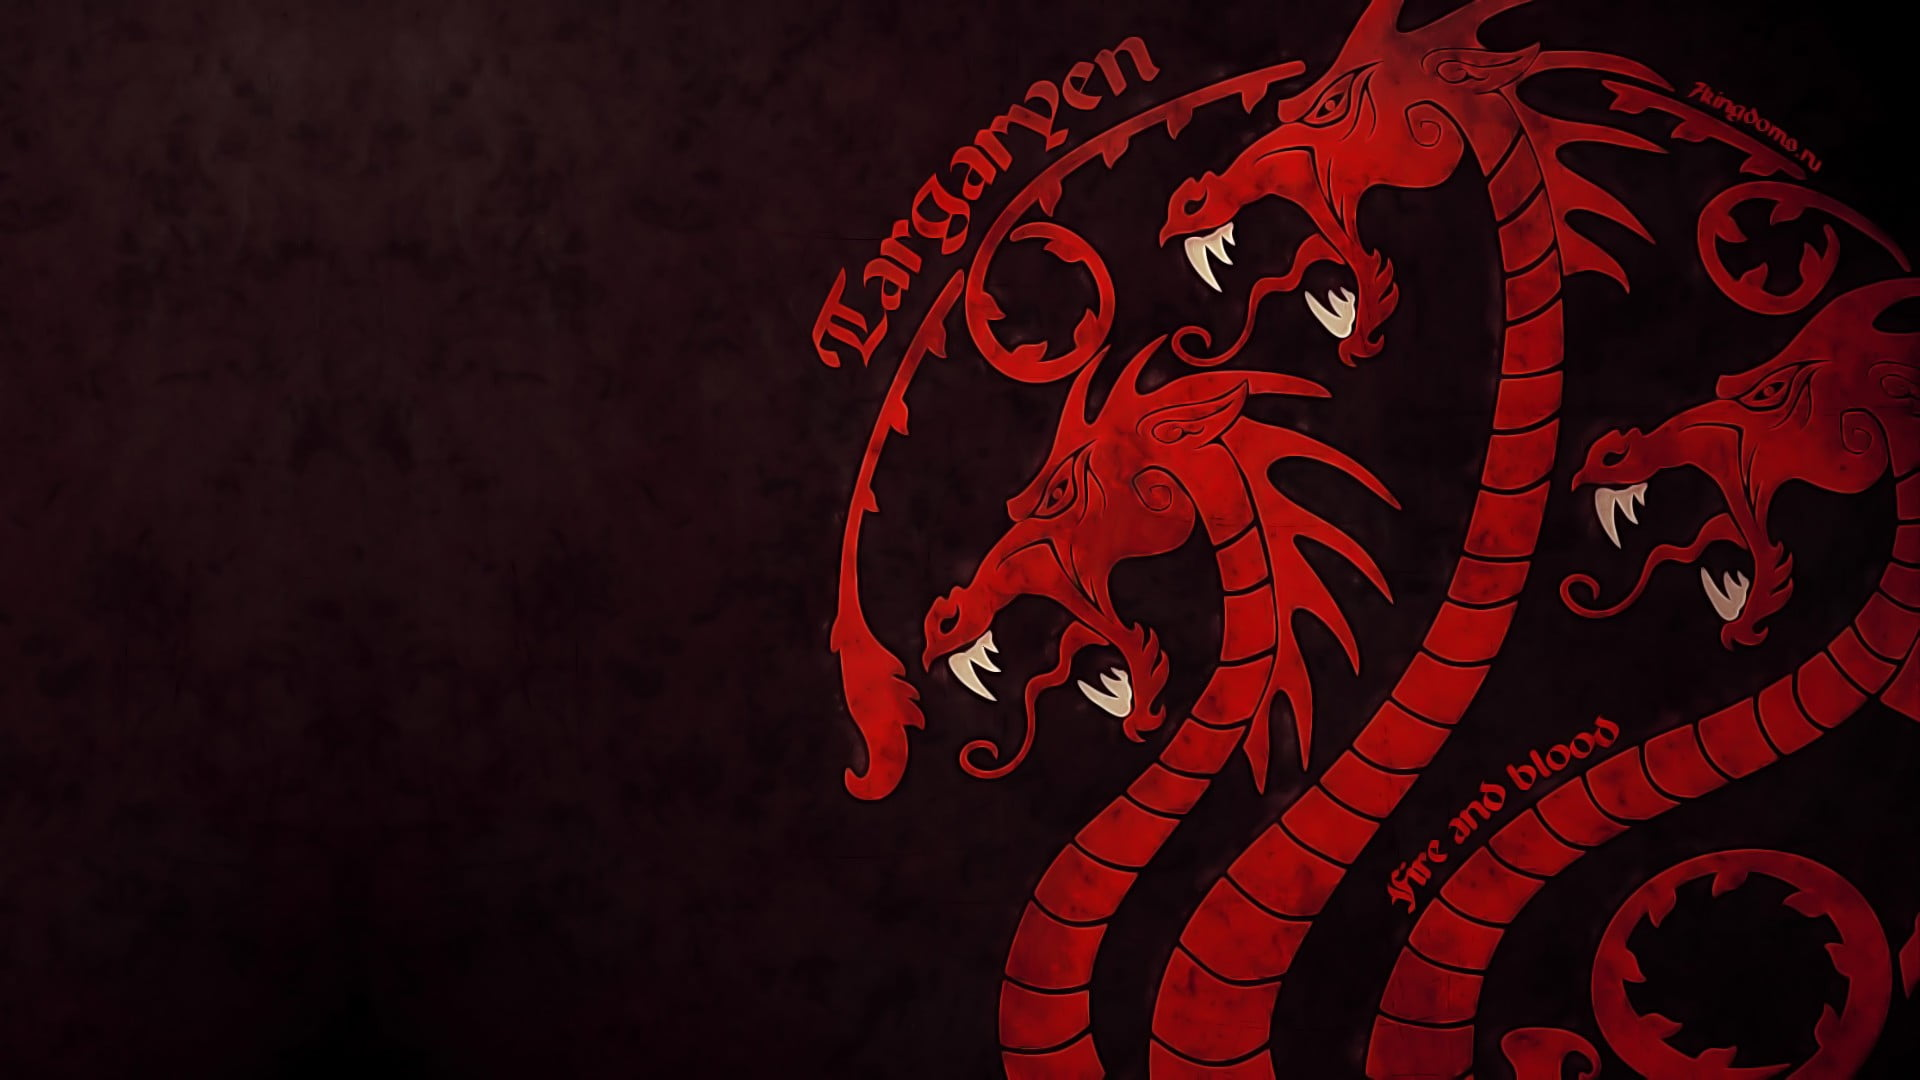 Game of Thrones House Targaryen sigil HD wallpaper Wallpaper Flare 1920x1080